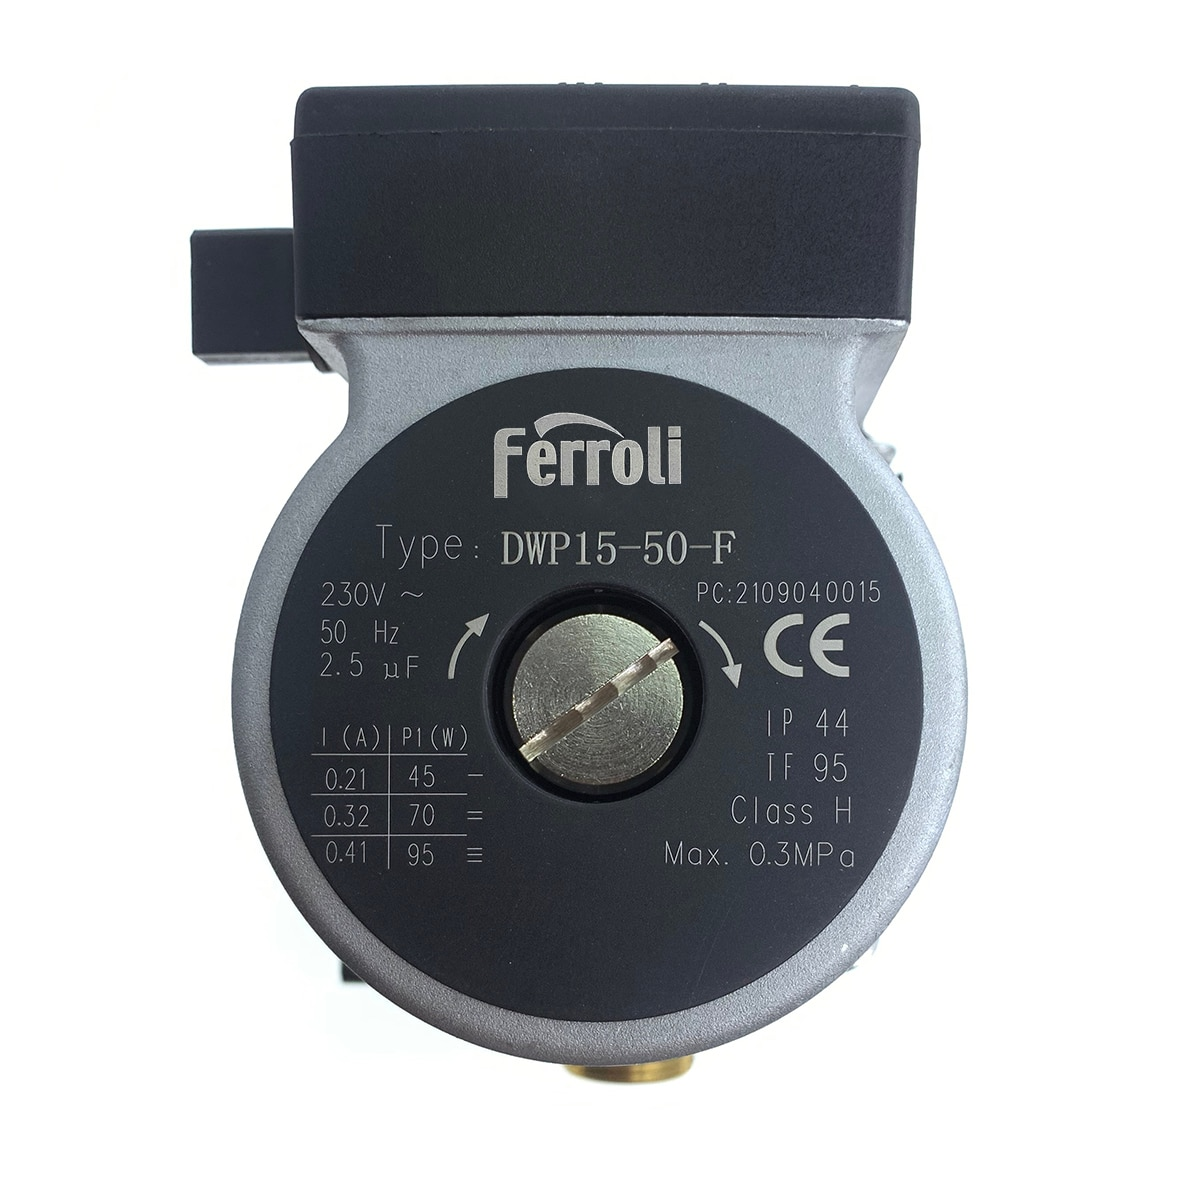 Ferroli DWP15-50-F 36600160 / 46660270 Boiler Water Circulation Pump for Fortuna & Diva Compatible with FRSL15/4.1 HE-3 KU C